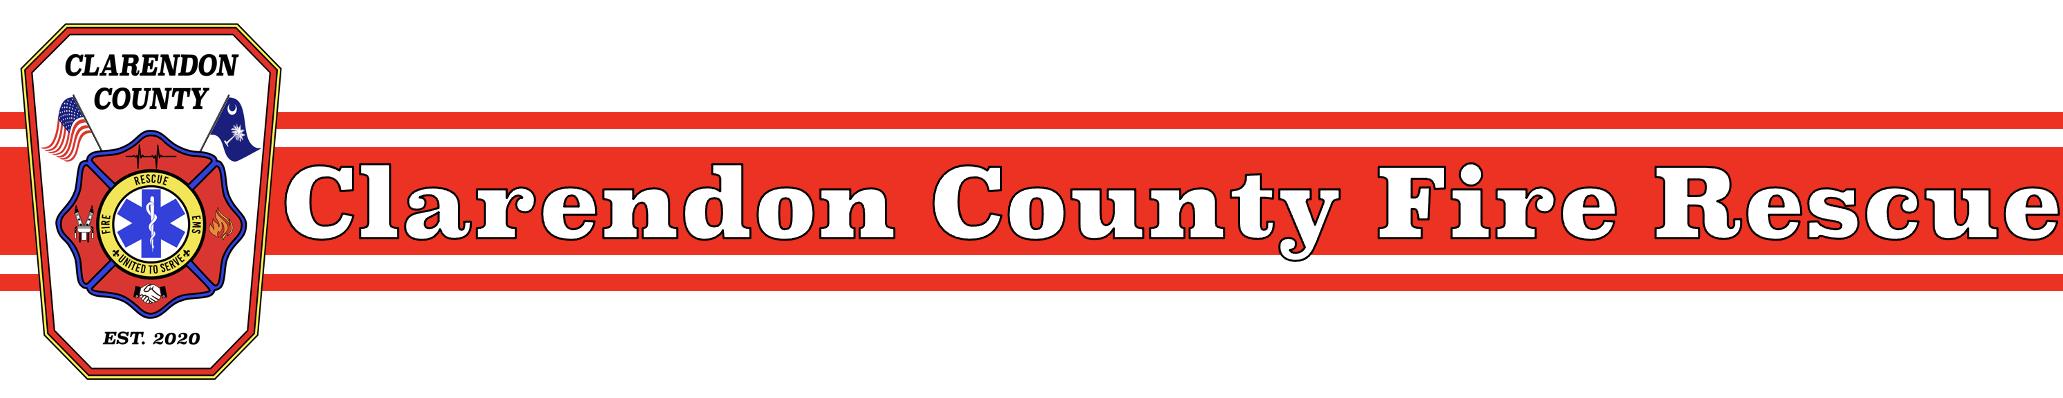 Clarendon County Fire Rescue